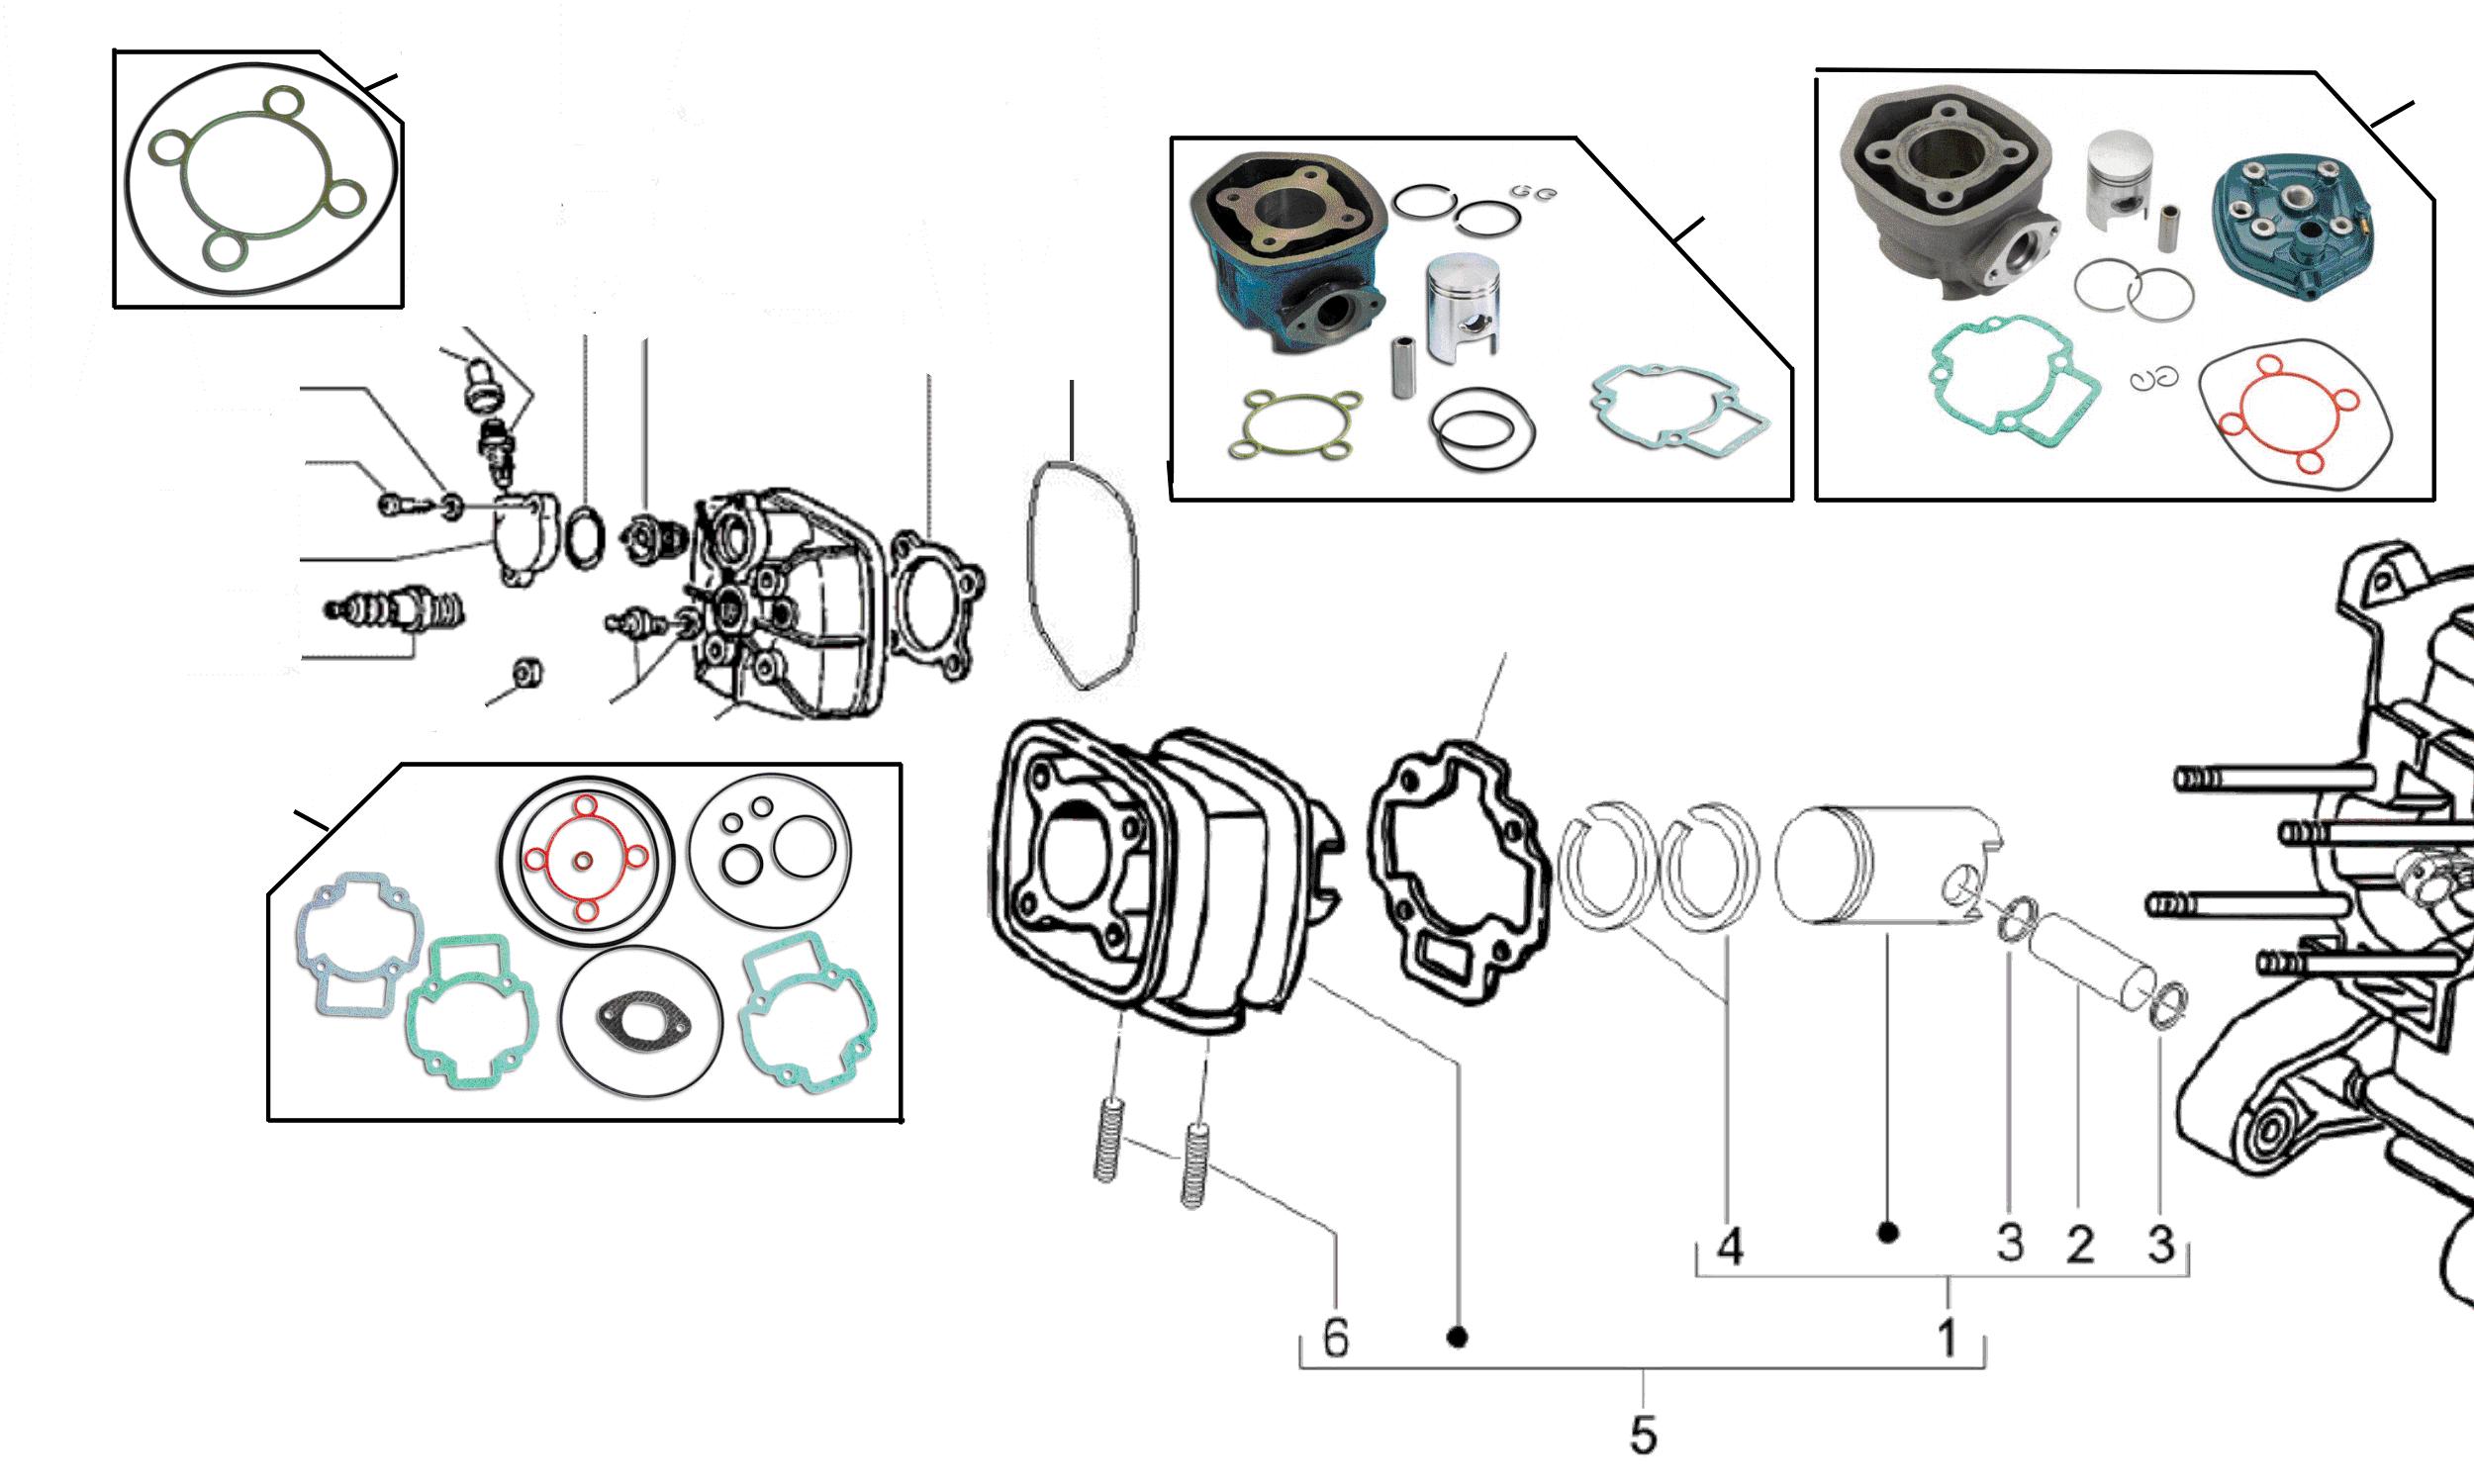 Zylinderkopf, Zylinder, Kolben